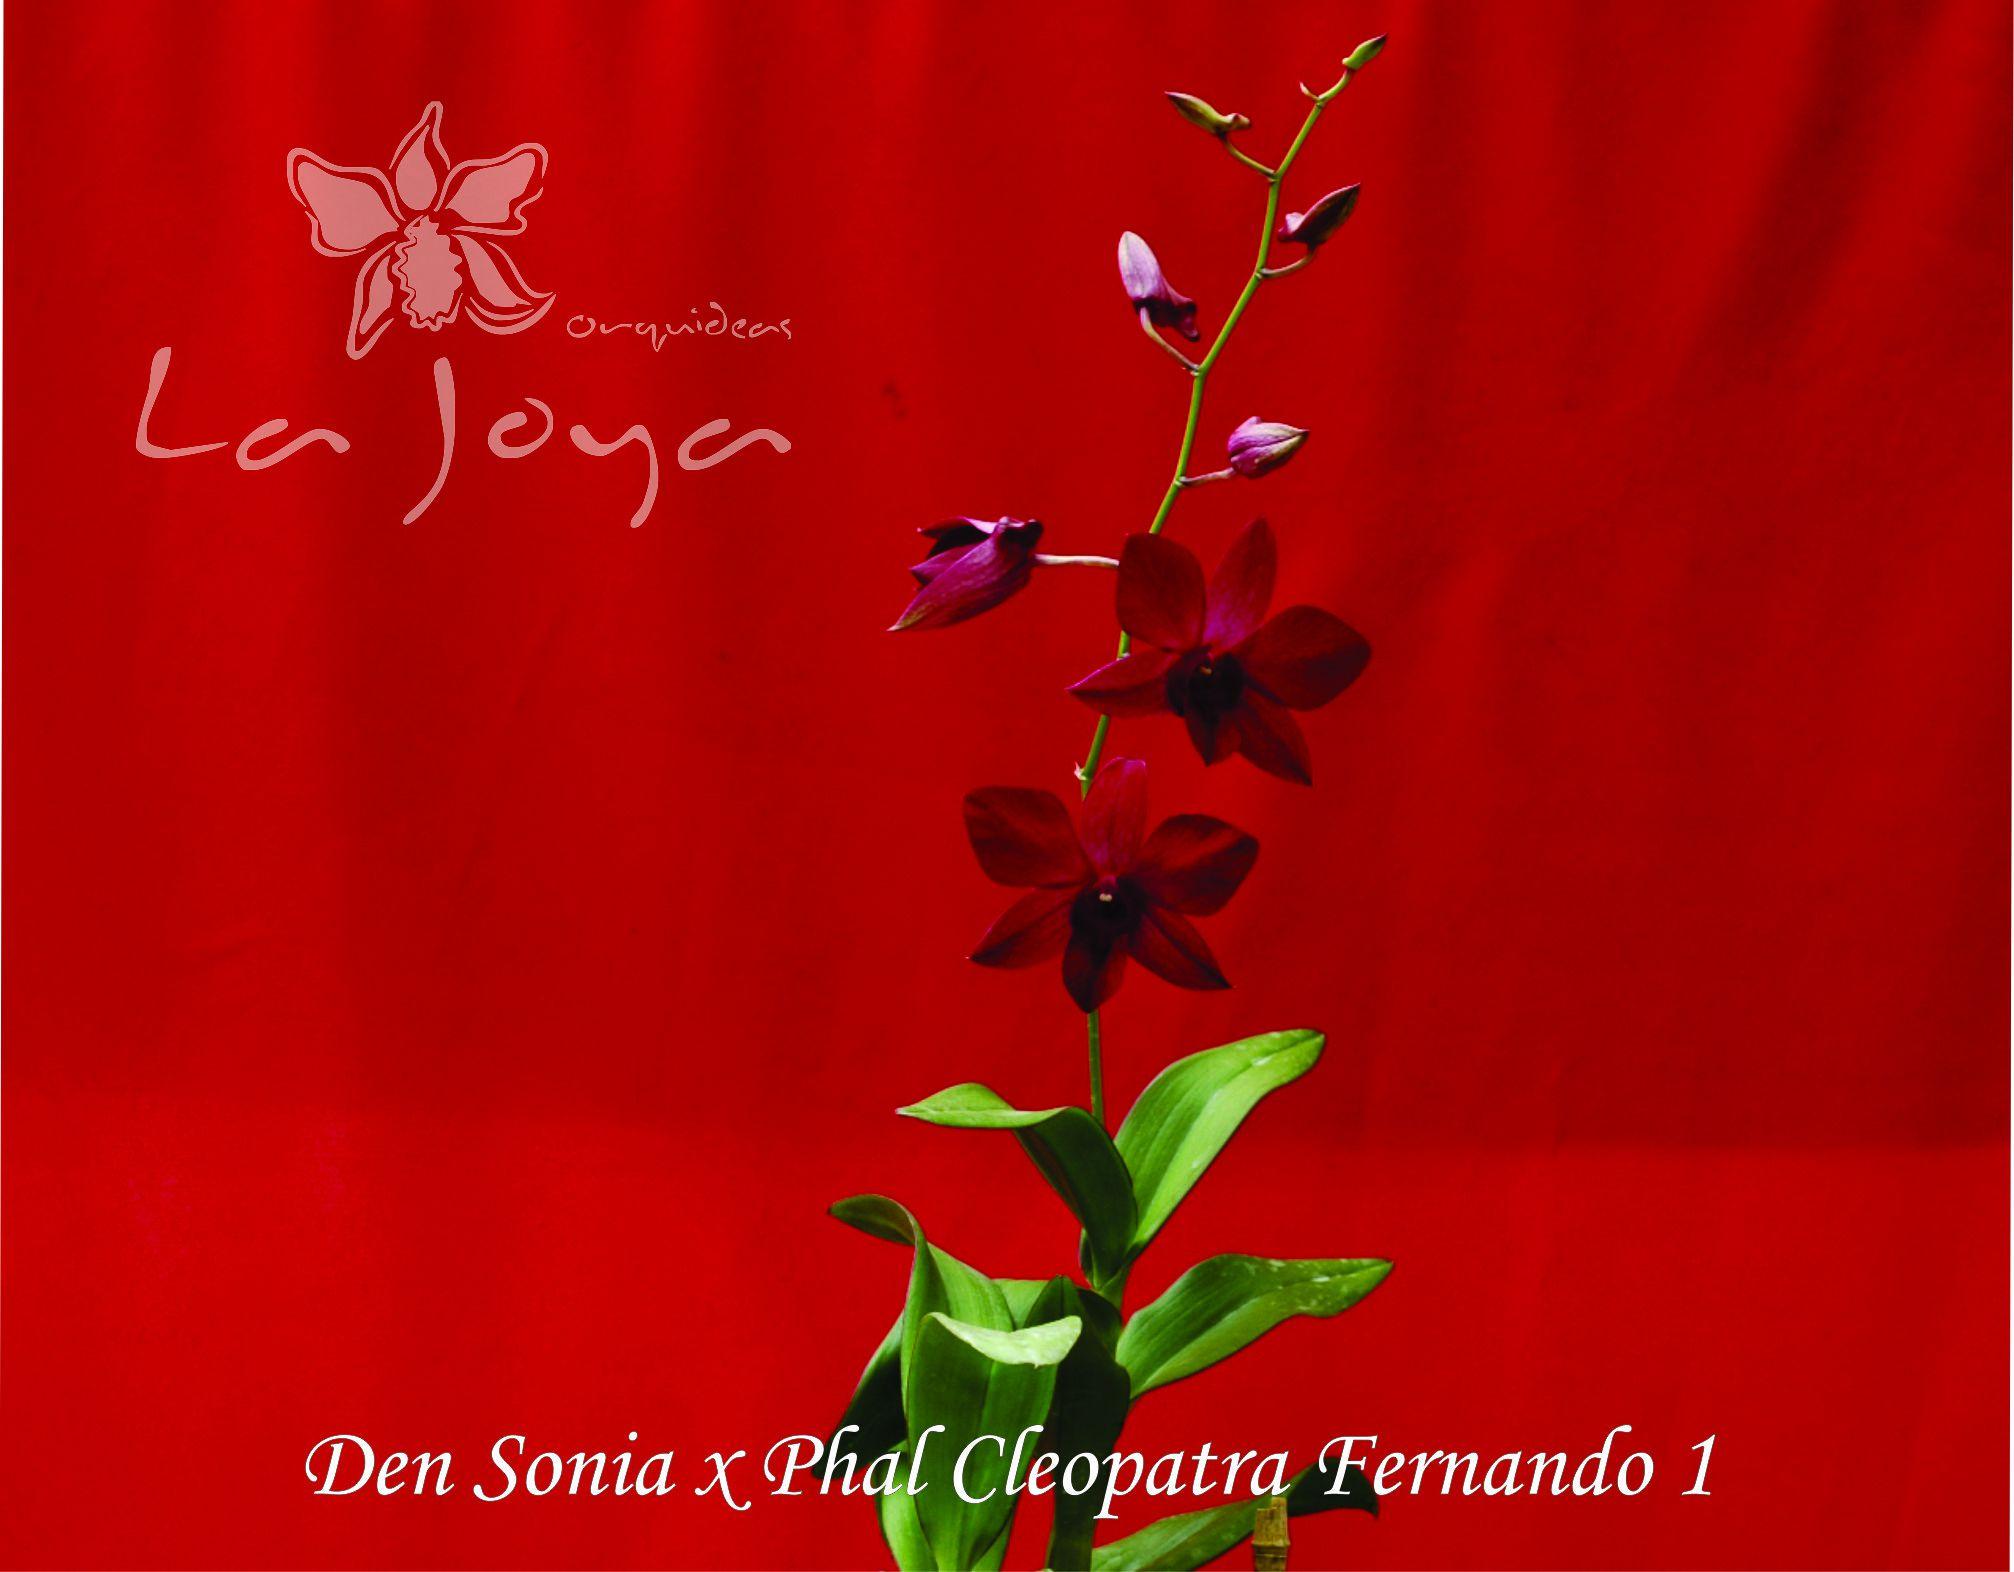 Den Sonia x Phal Cleopatra Fernando